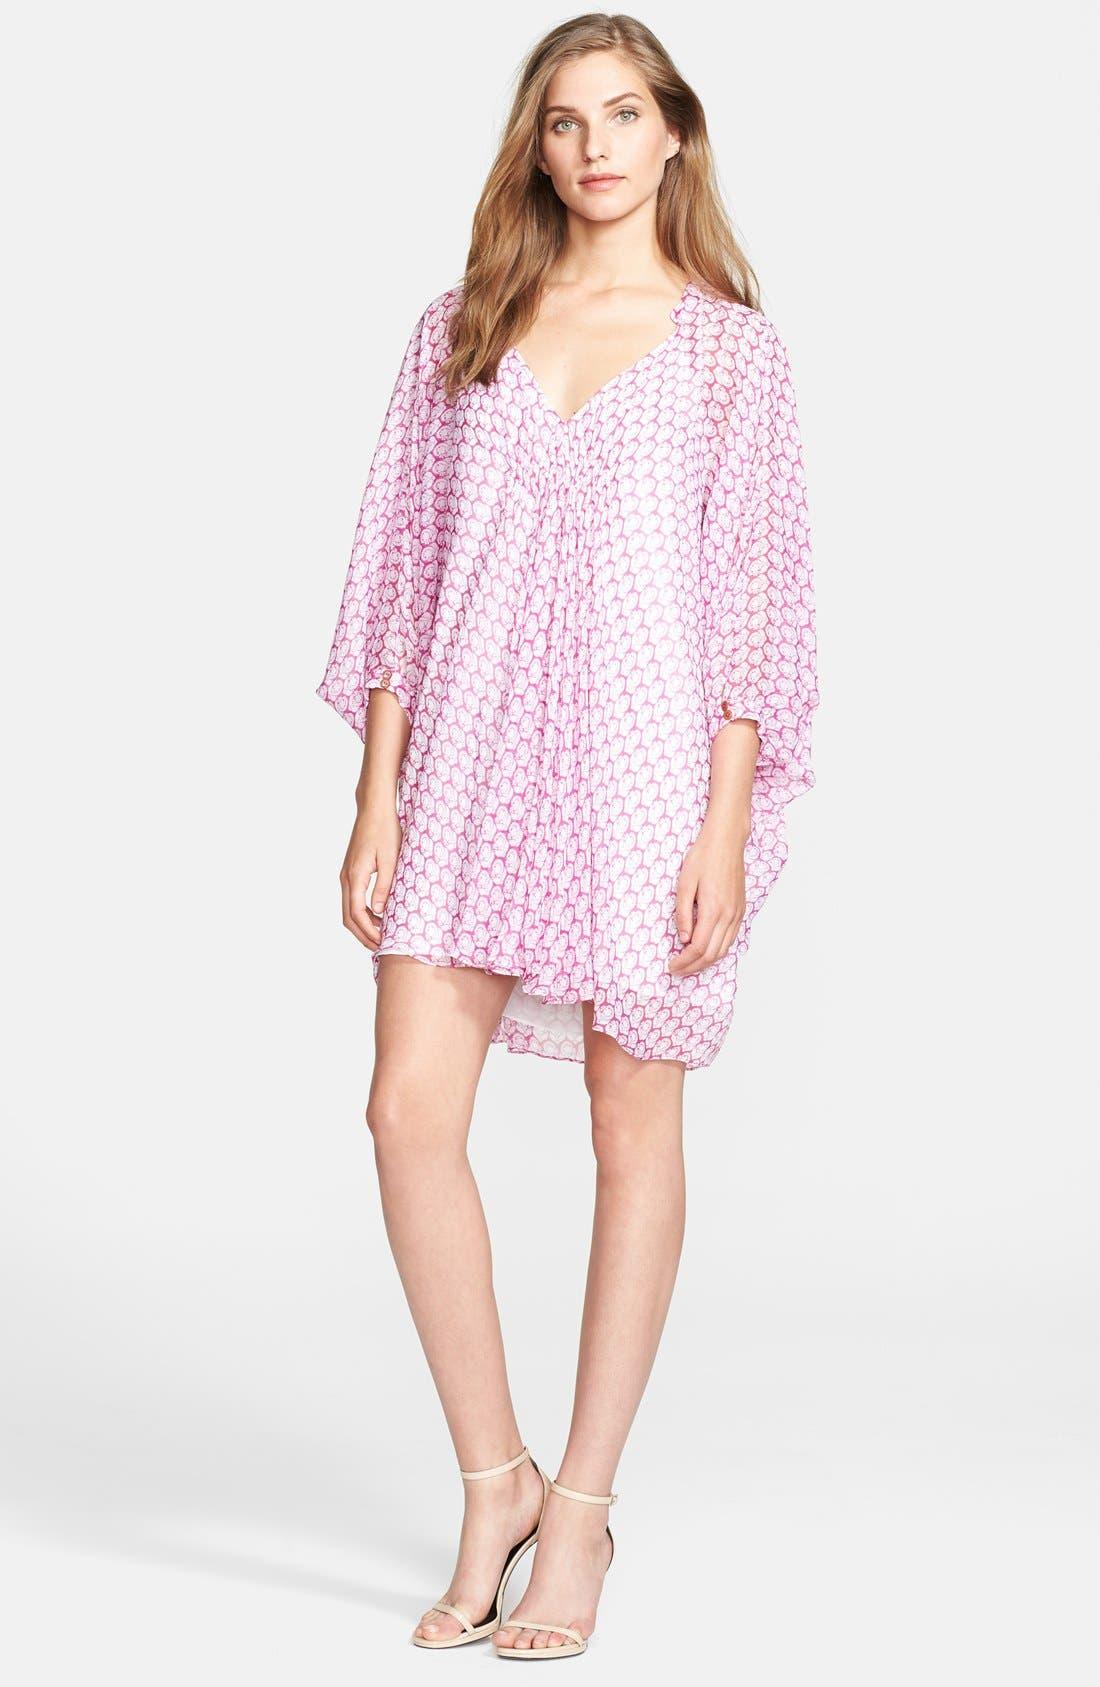 Alternate Image 1 Selected - Diane von Furstenberg 'Fleurette' Stretch Silk Tunic Dress